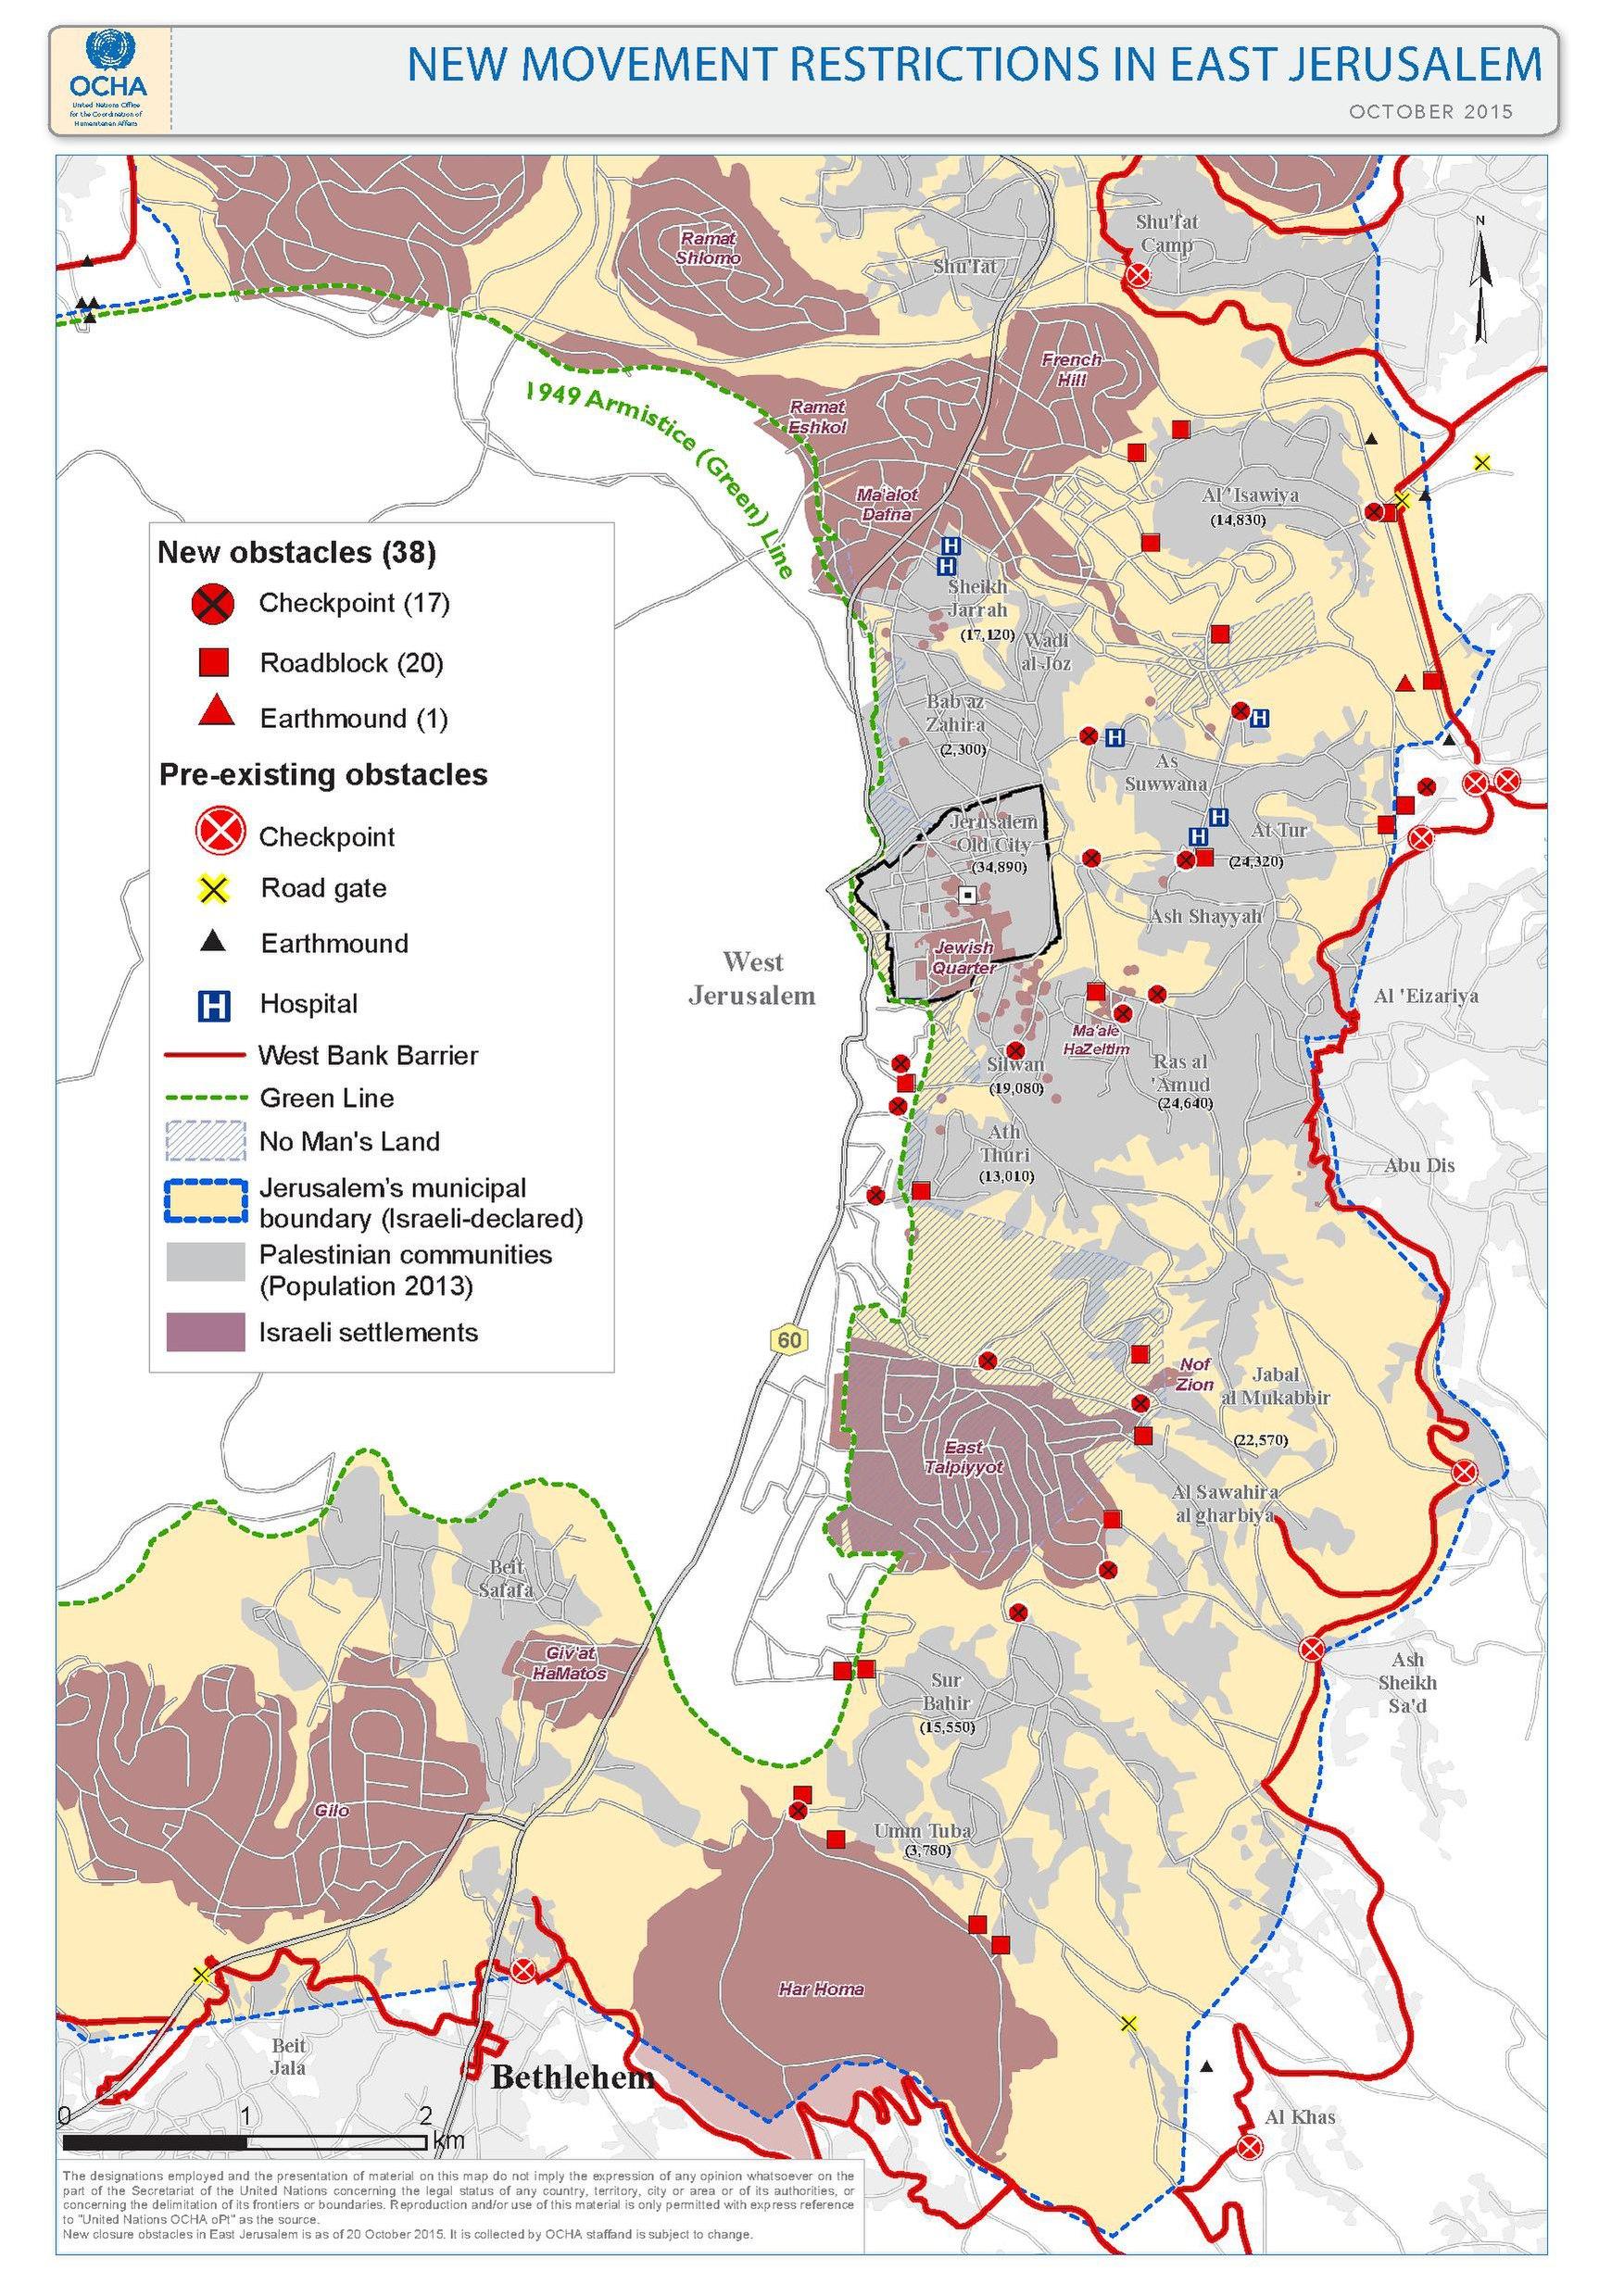 Fileeast jerusalem october 2015 access restrictionspdf wikimedia fileeast jerusalem october 2015 access restrictionspdf gumiabroncs Images